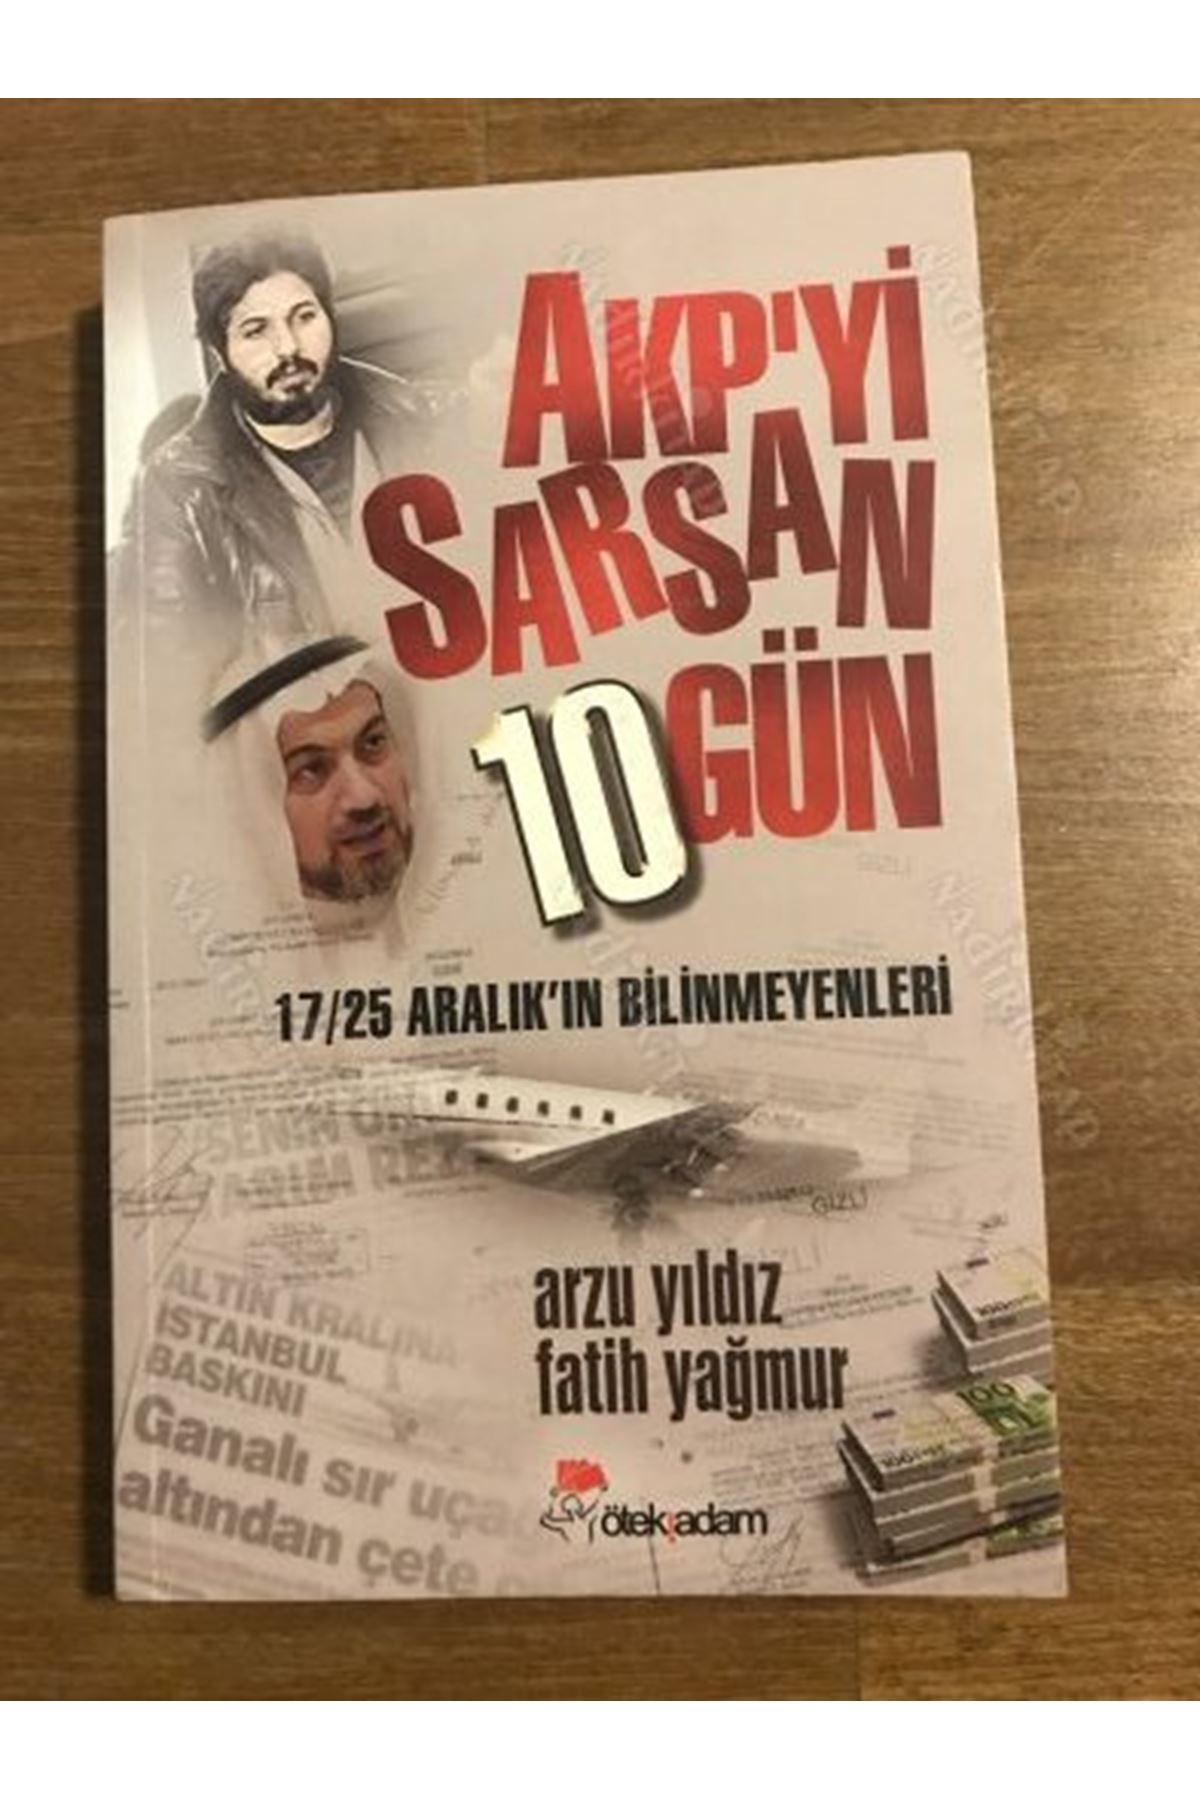 ARZU YILDIZ - AKP'Yİ SARSAN 10 GÜN